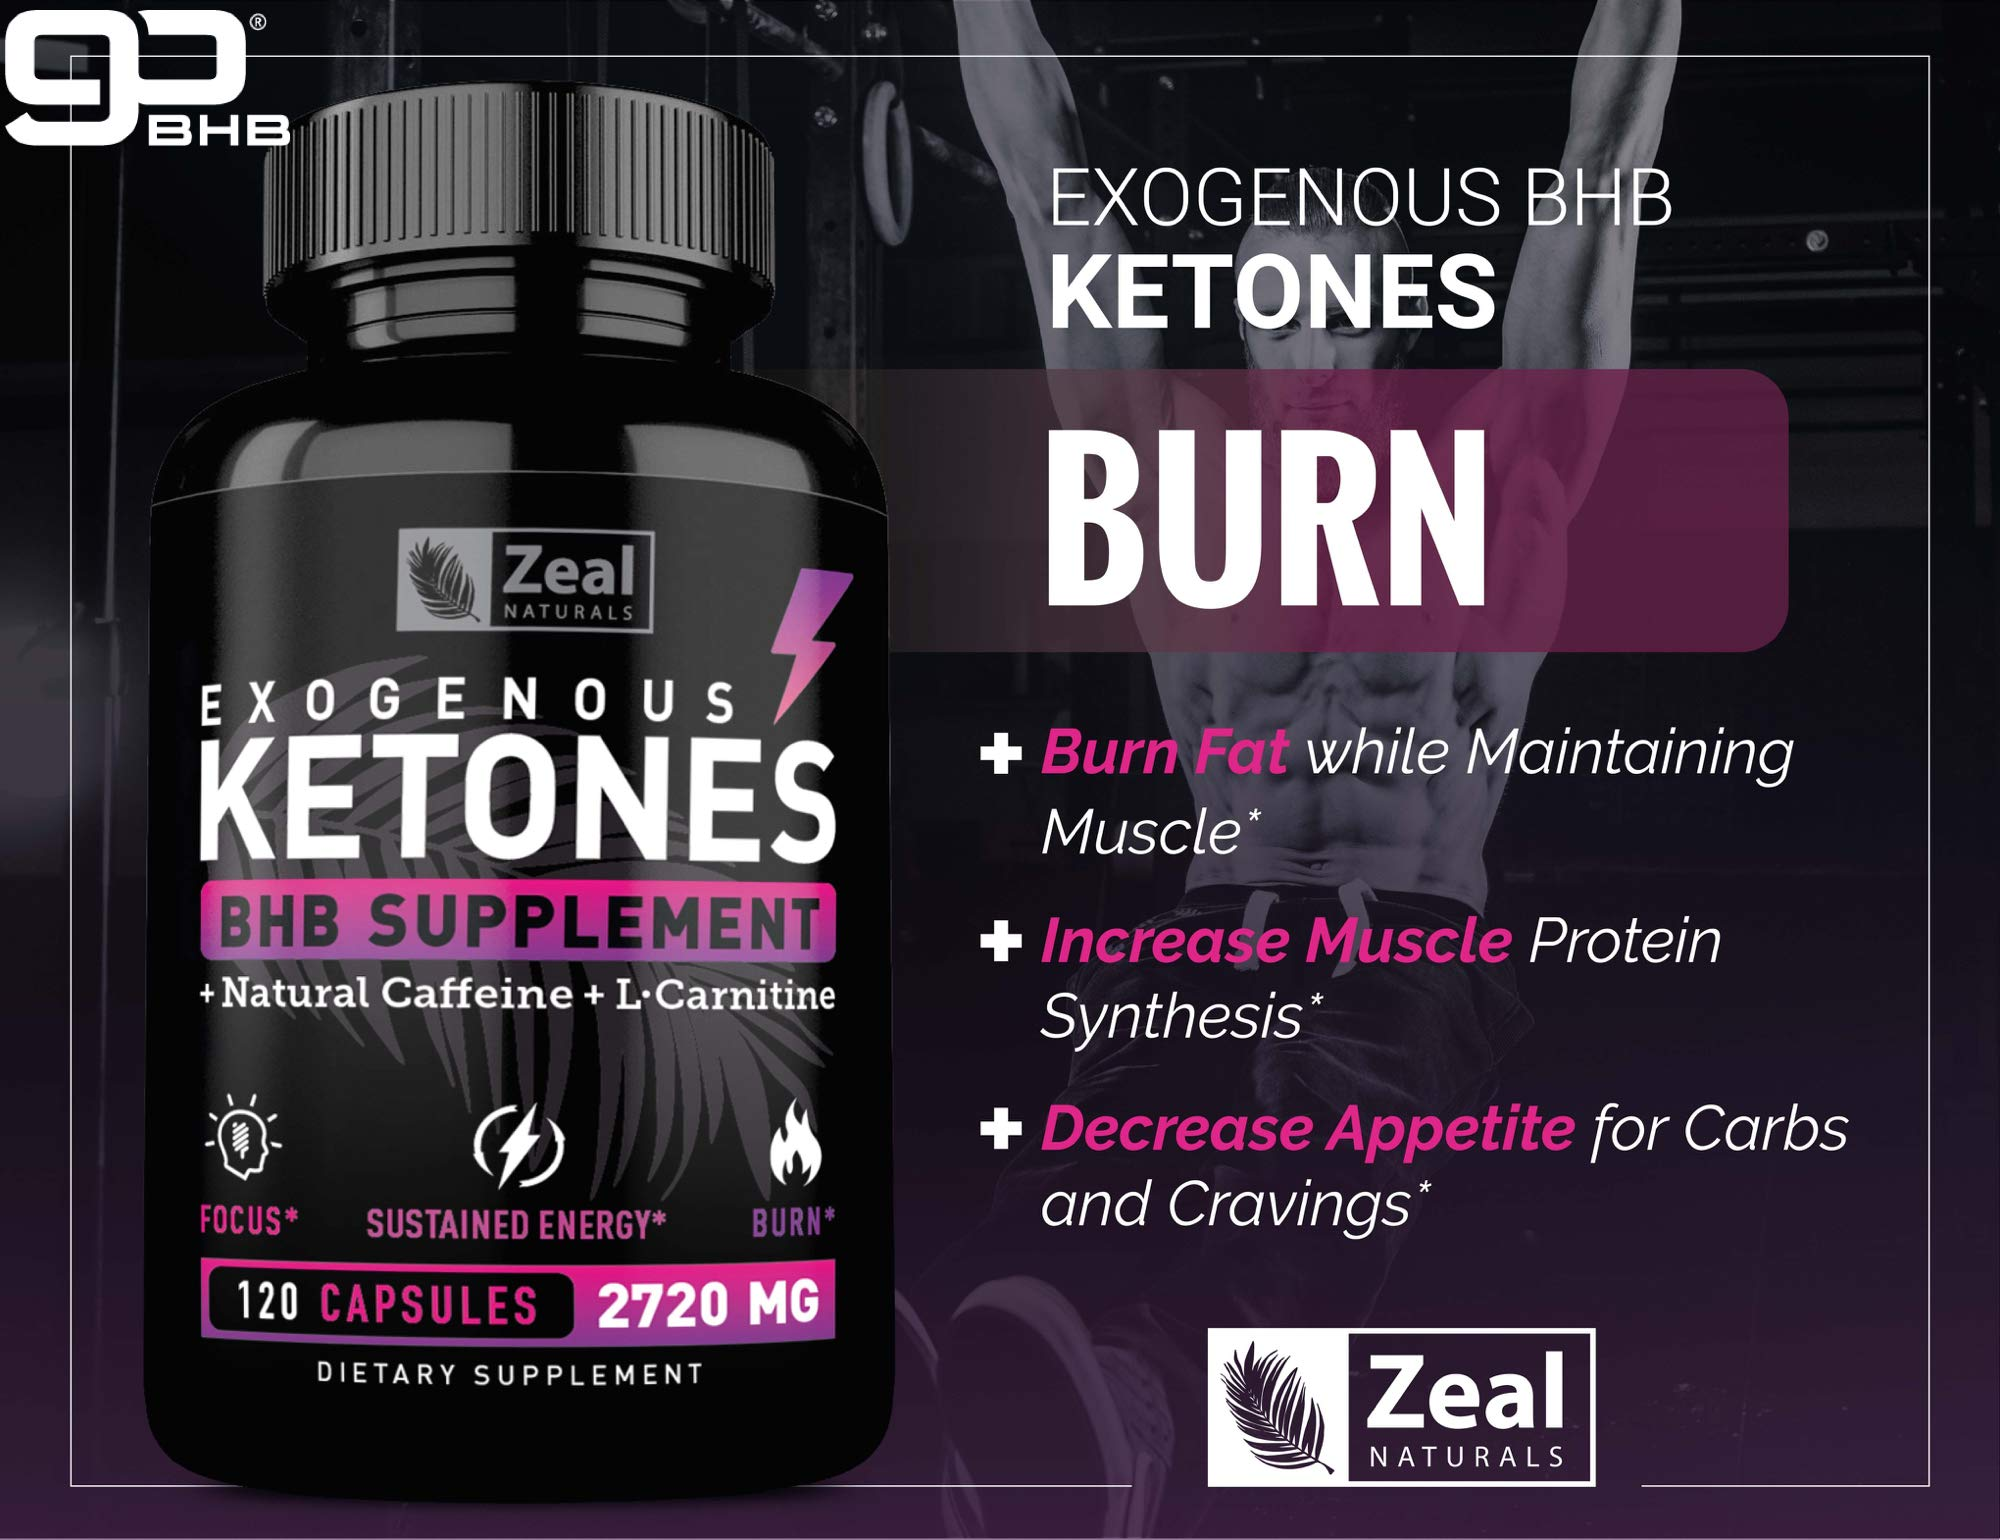 Keto BHB Exogenous Ketones Pills (2720mg | 120 Capsules) Keto Pills w. goBHB Salts, Natural Caffeine & L-Carnitine - Keto BHB Oil Capsules Beta Hydroxybutyrate for Weight Loss Keto Vitamins Keto Salts by Zeal Naturals (Image #6)